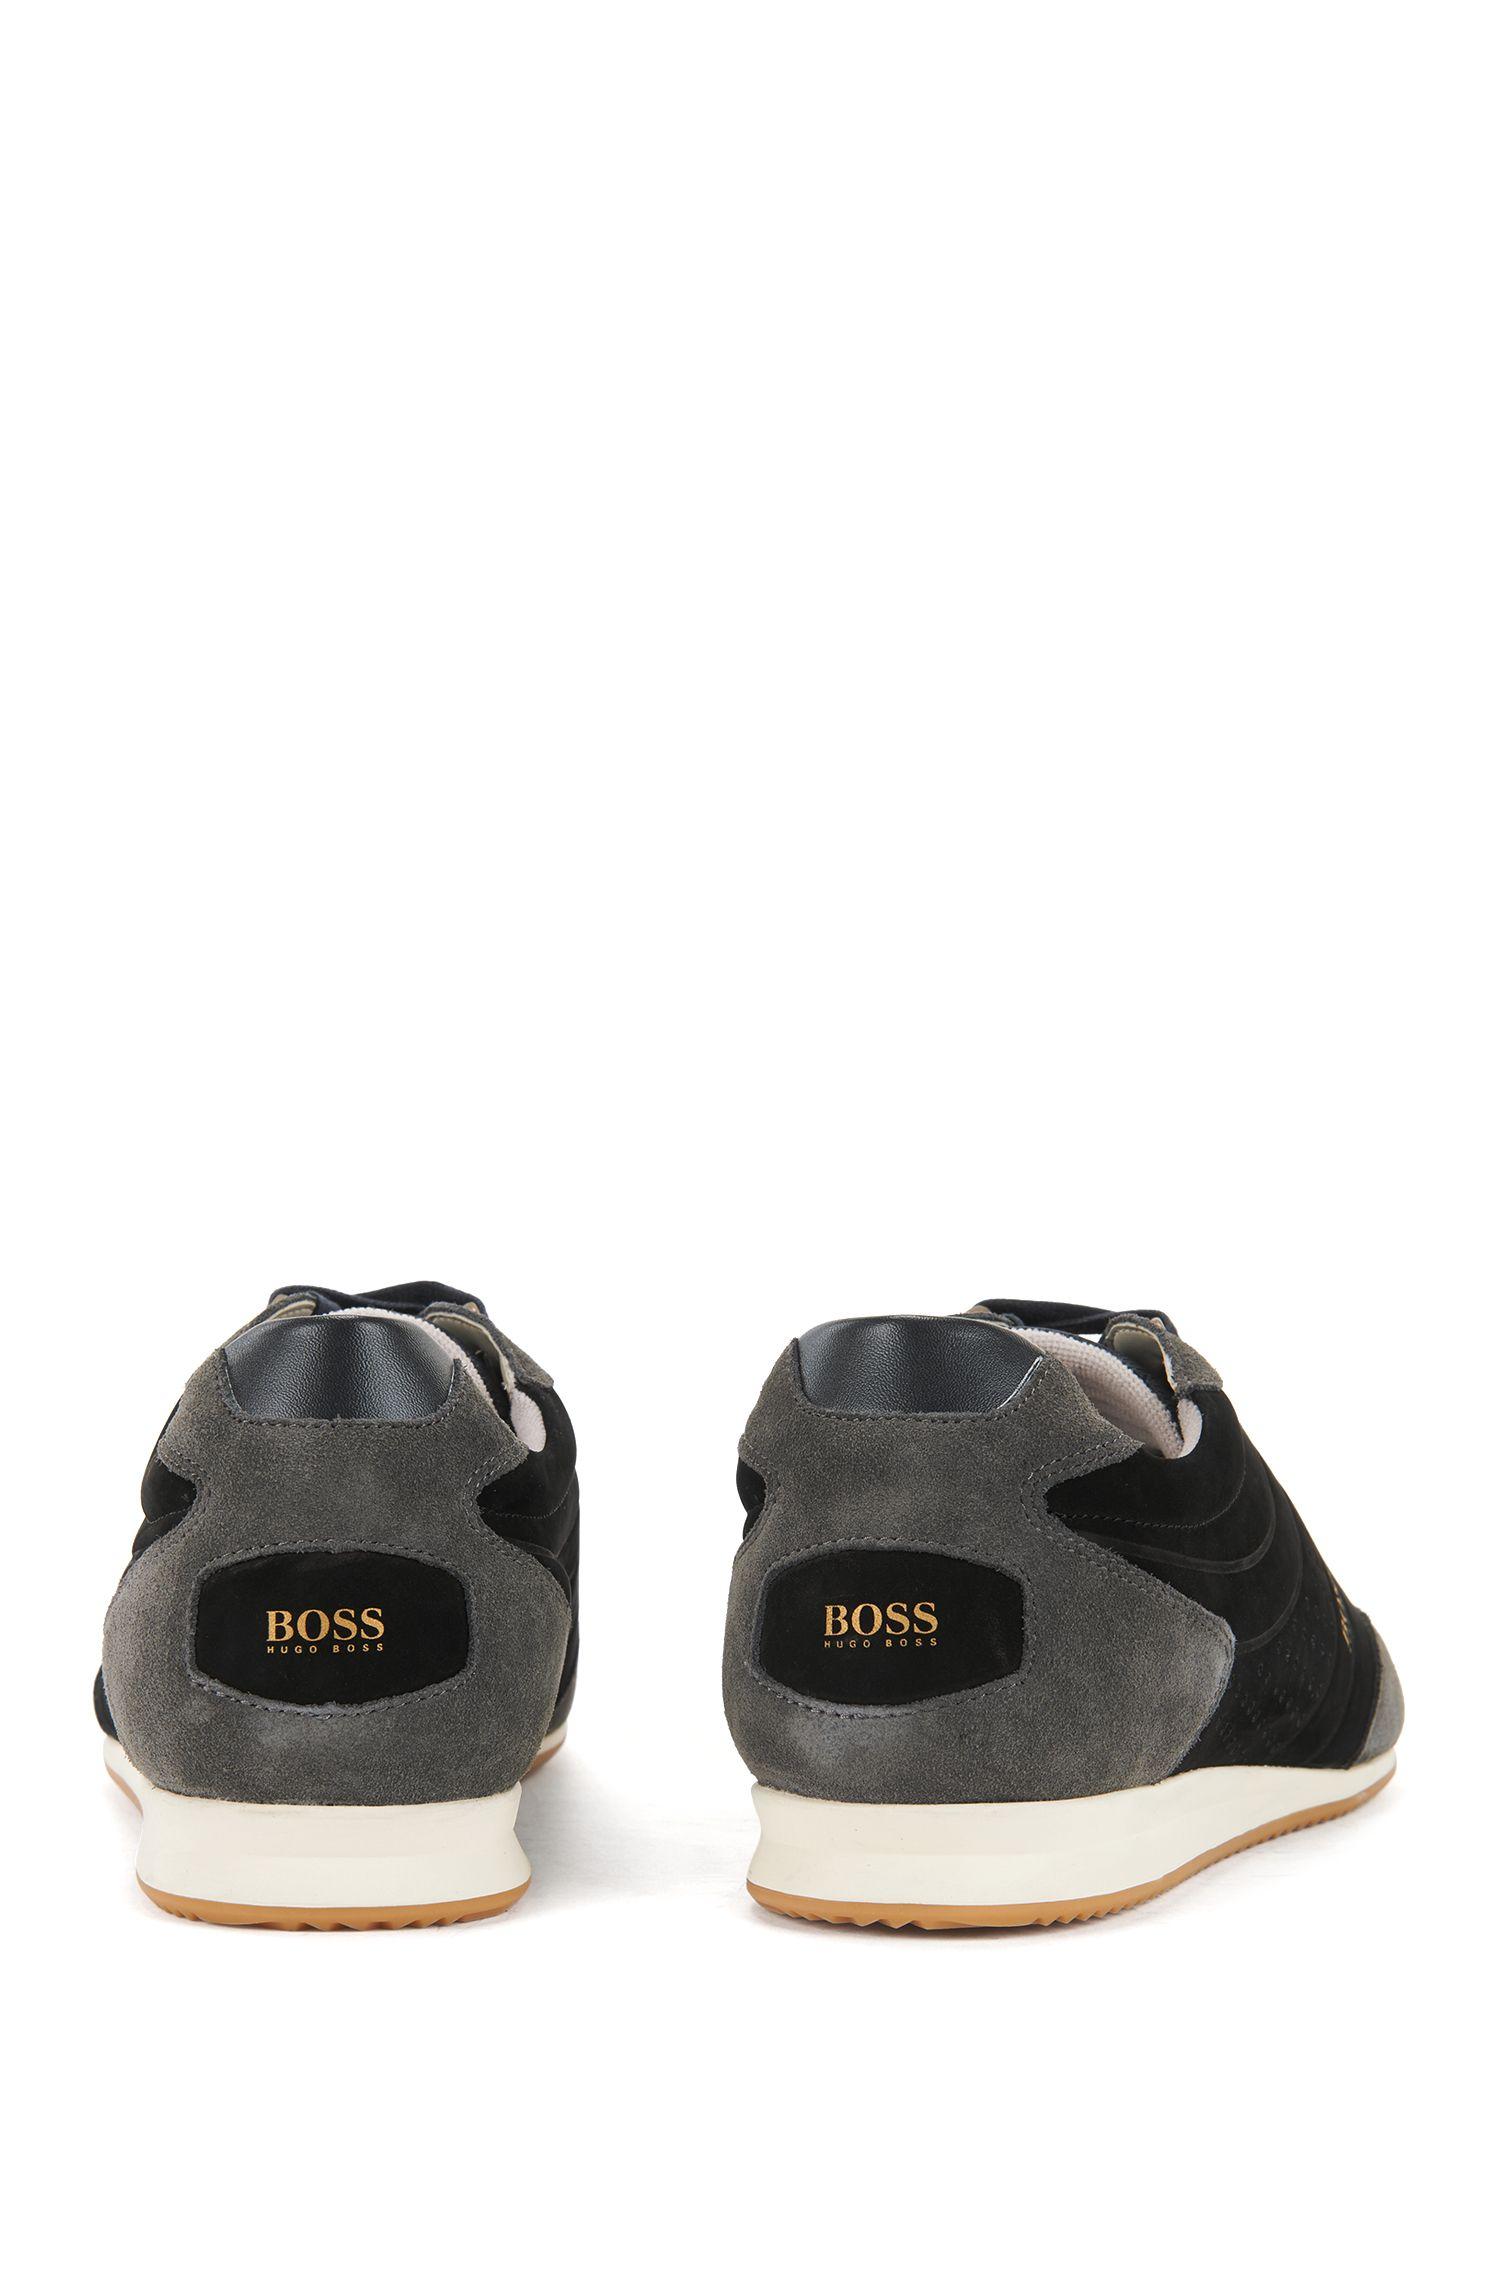 Lowtop Sneakers aus Nubukleder